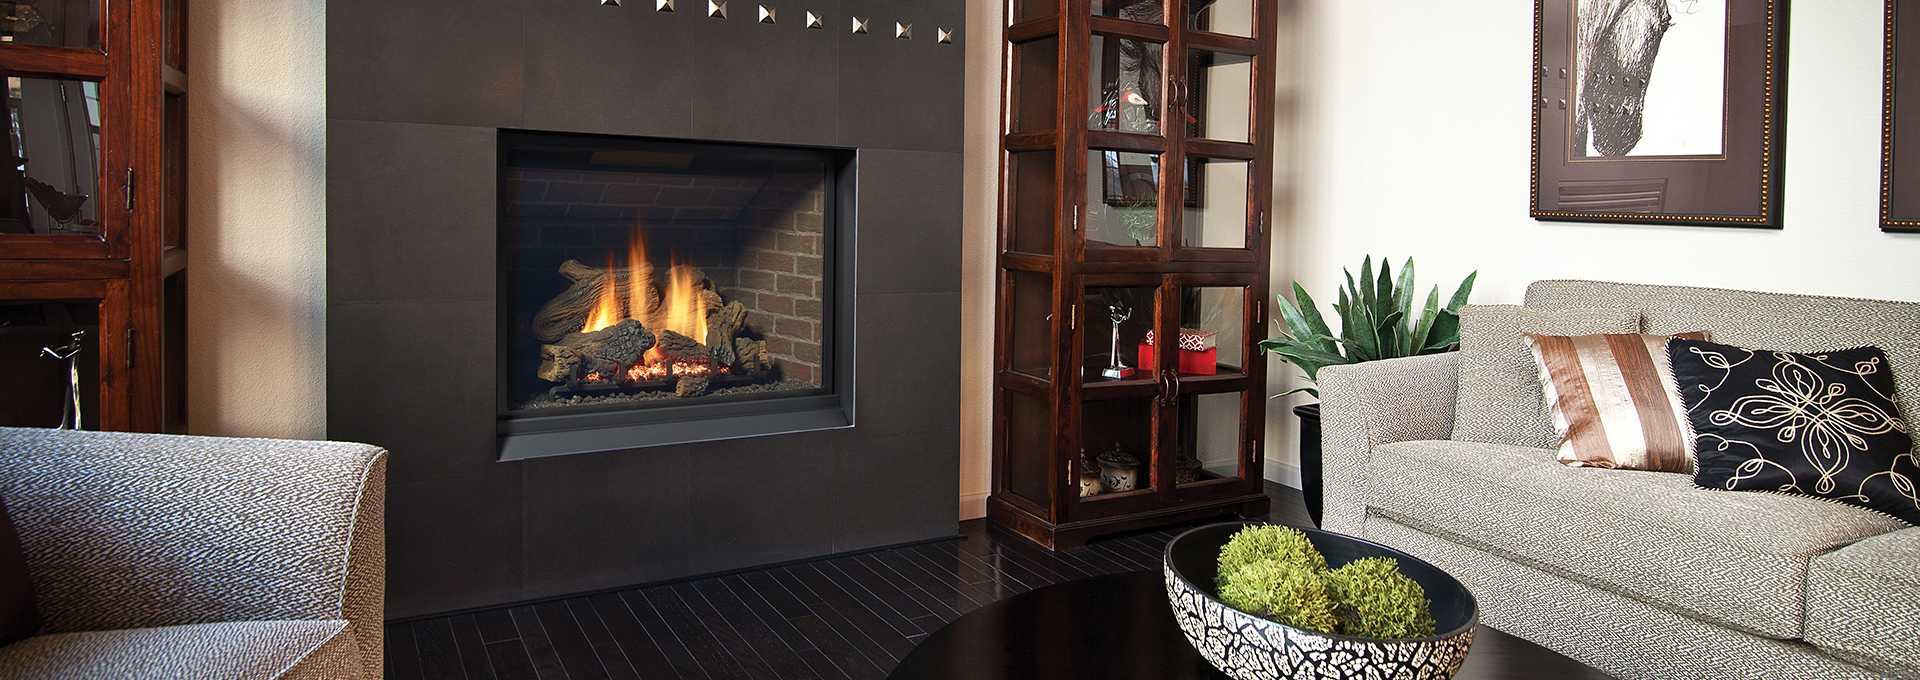 Bellavista B41XTCE Gas Fireplace-2